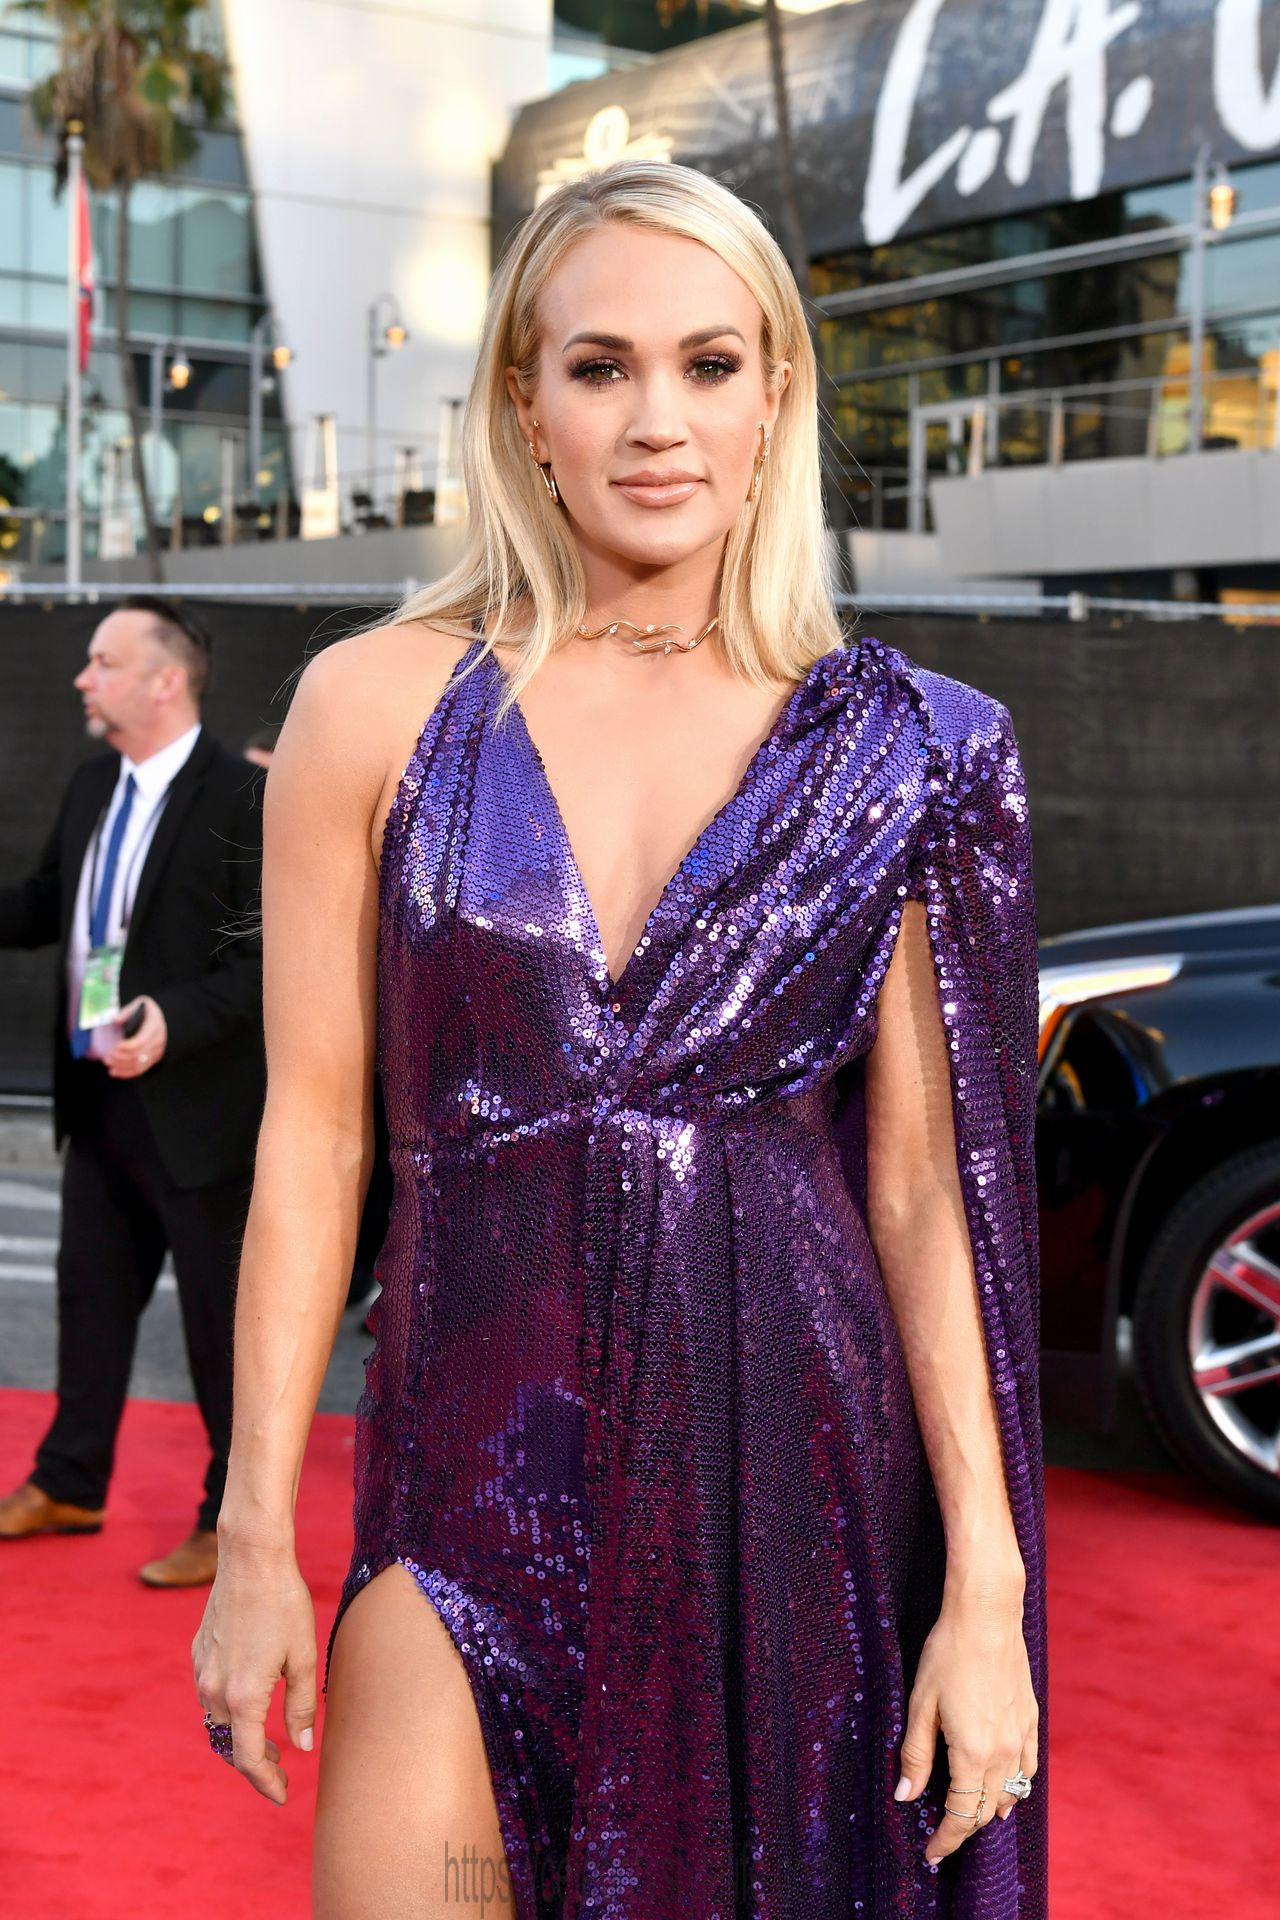 Carrie Underwood in 2019